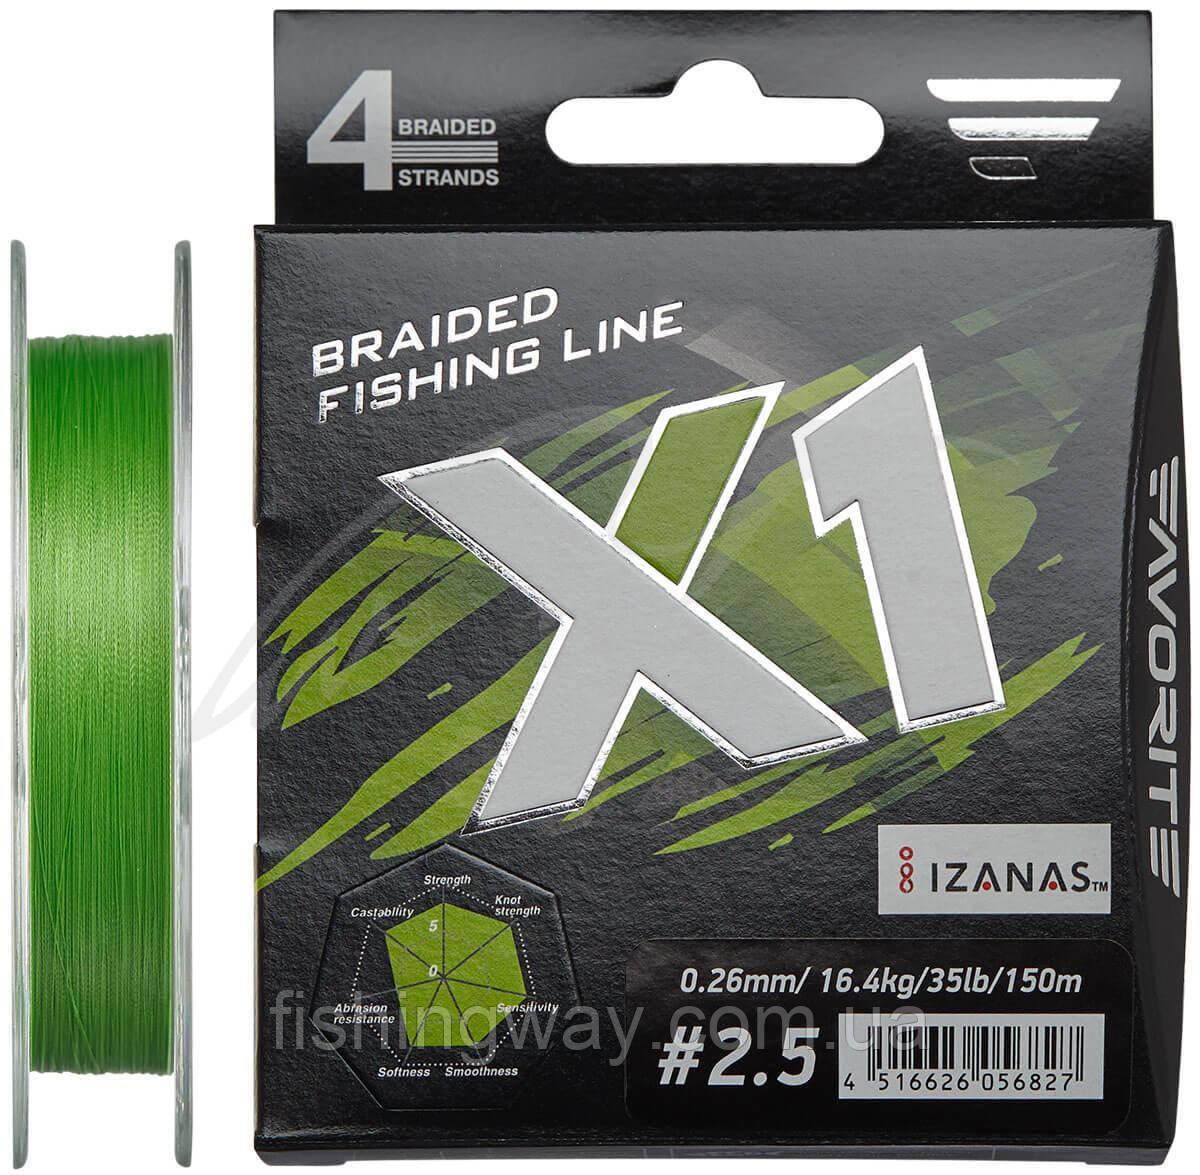 Шнур Favorite X1 PE 4x 150m (l.green) #2.5/0.260 mm 35lb/16.4 kg